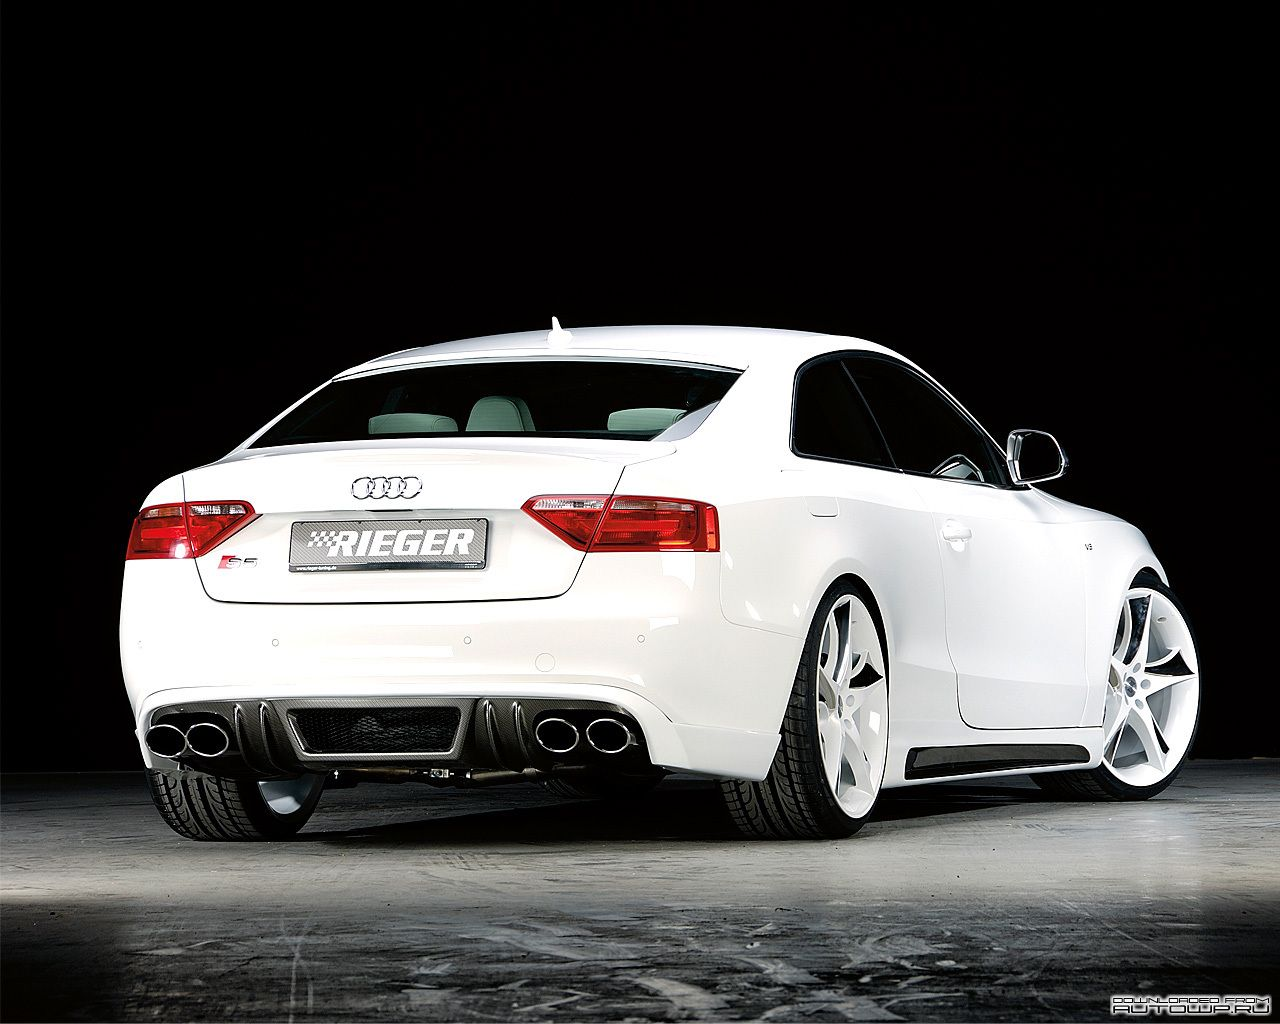 Audi Rs5 Ssaaaaawwweet Audi S5 Audi Cars Audi A5